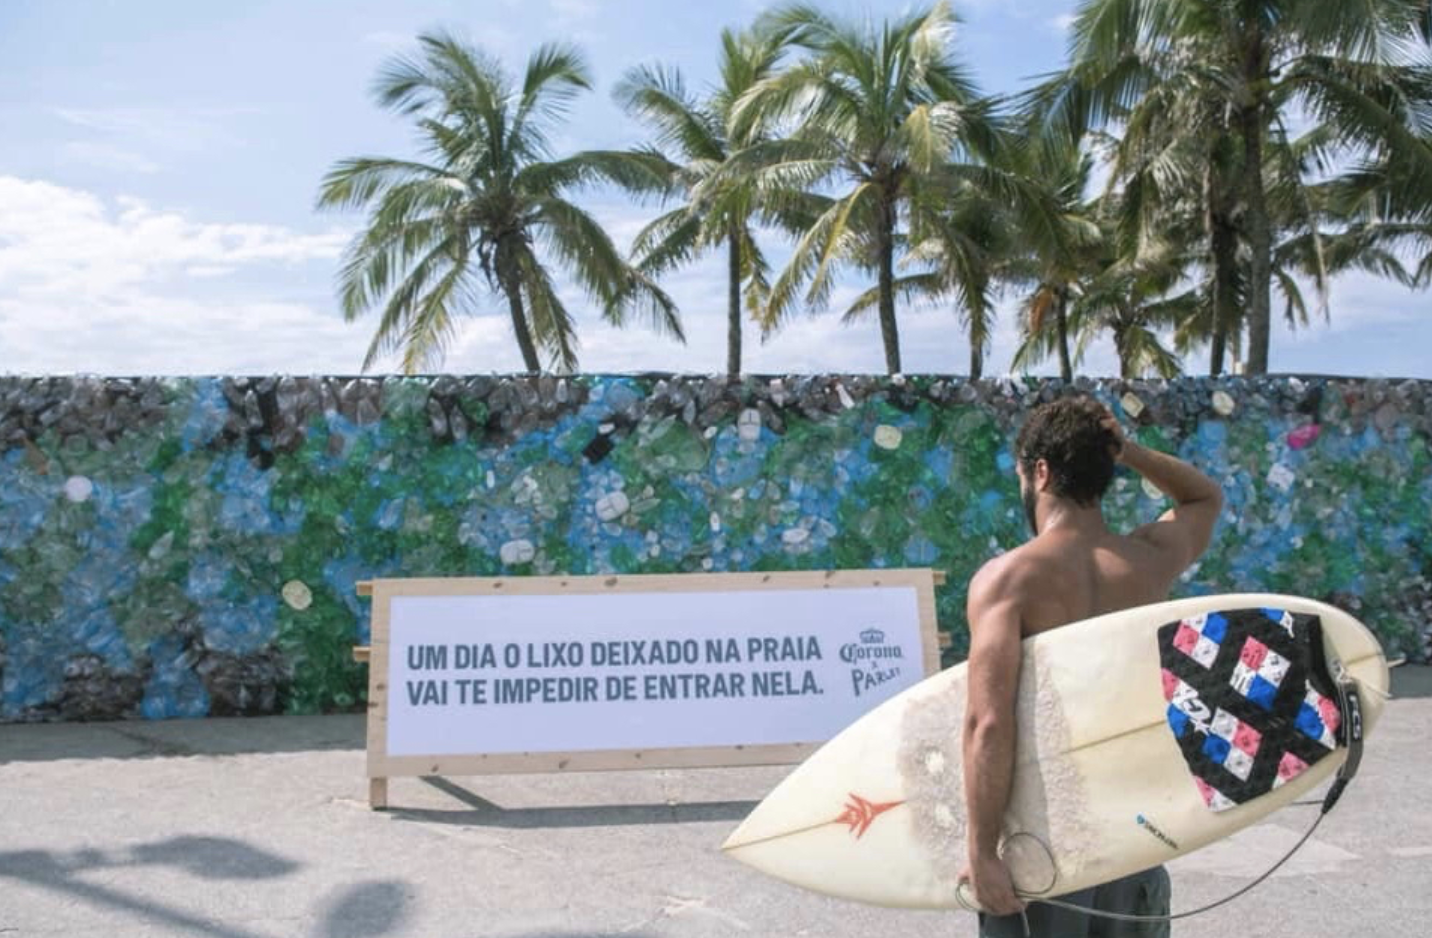 Corona's 'Trash wall' at Ipanema Beach, Brazil.